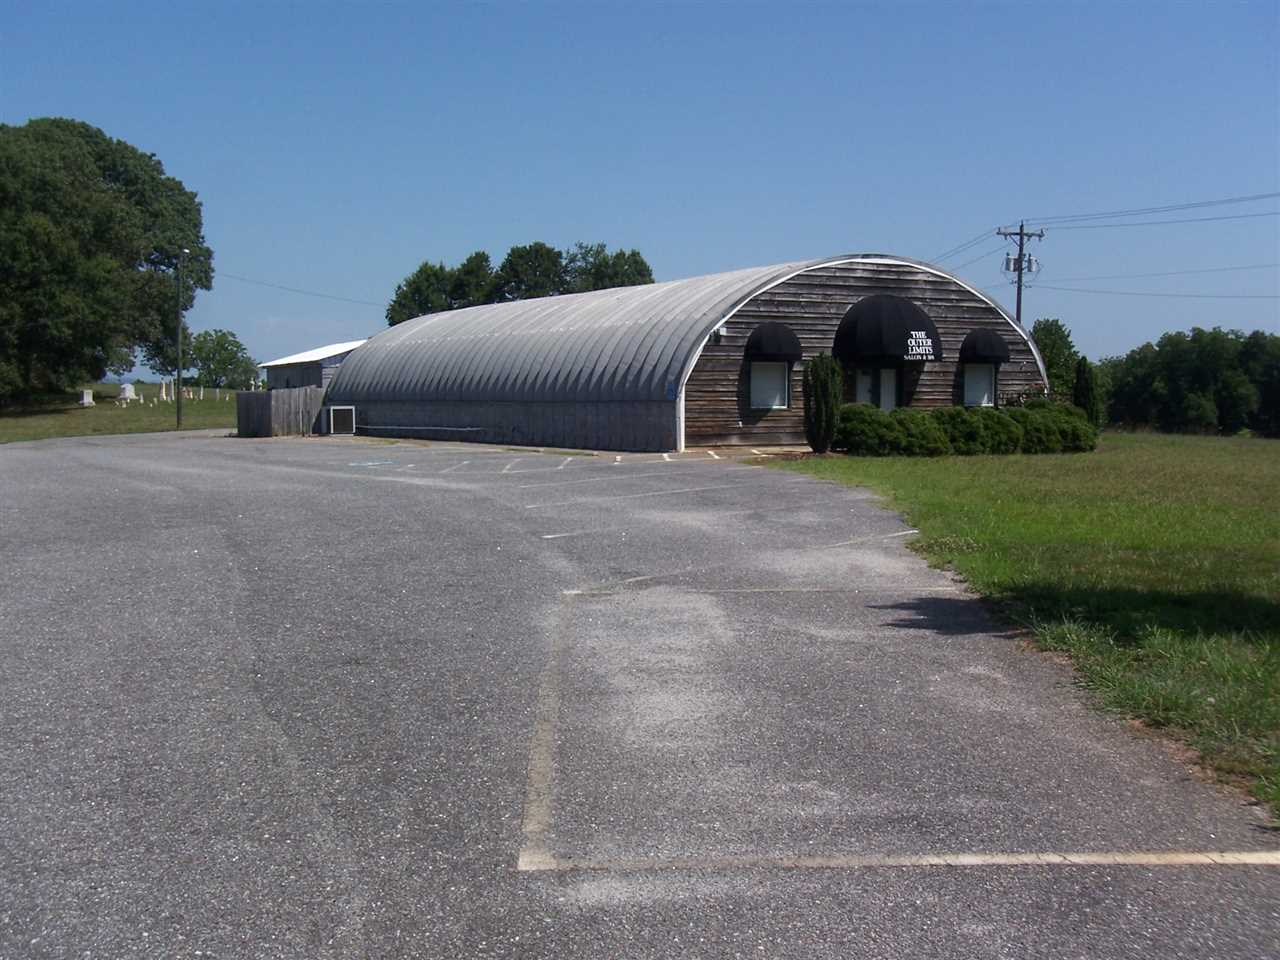 318 McBrayer Homestead Road, Shelby, NC 28152